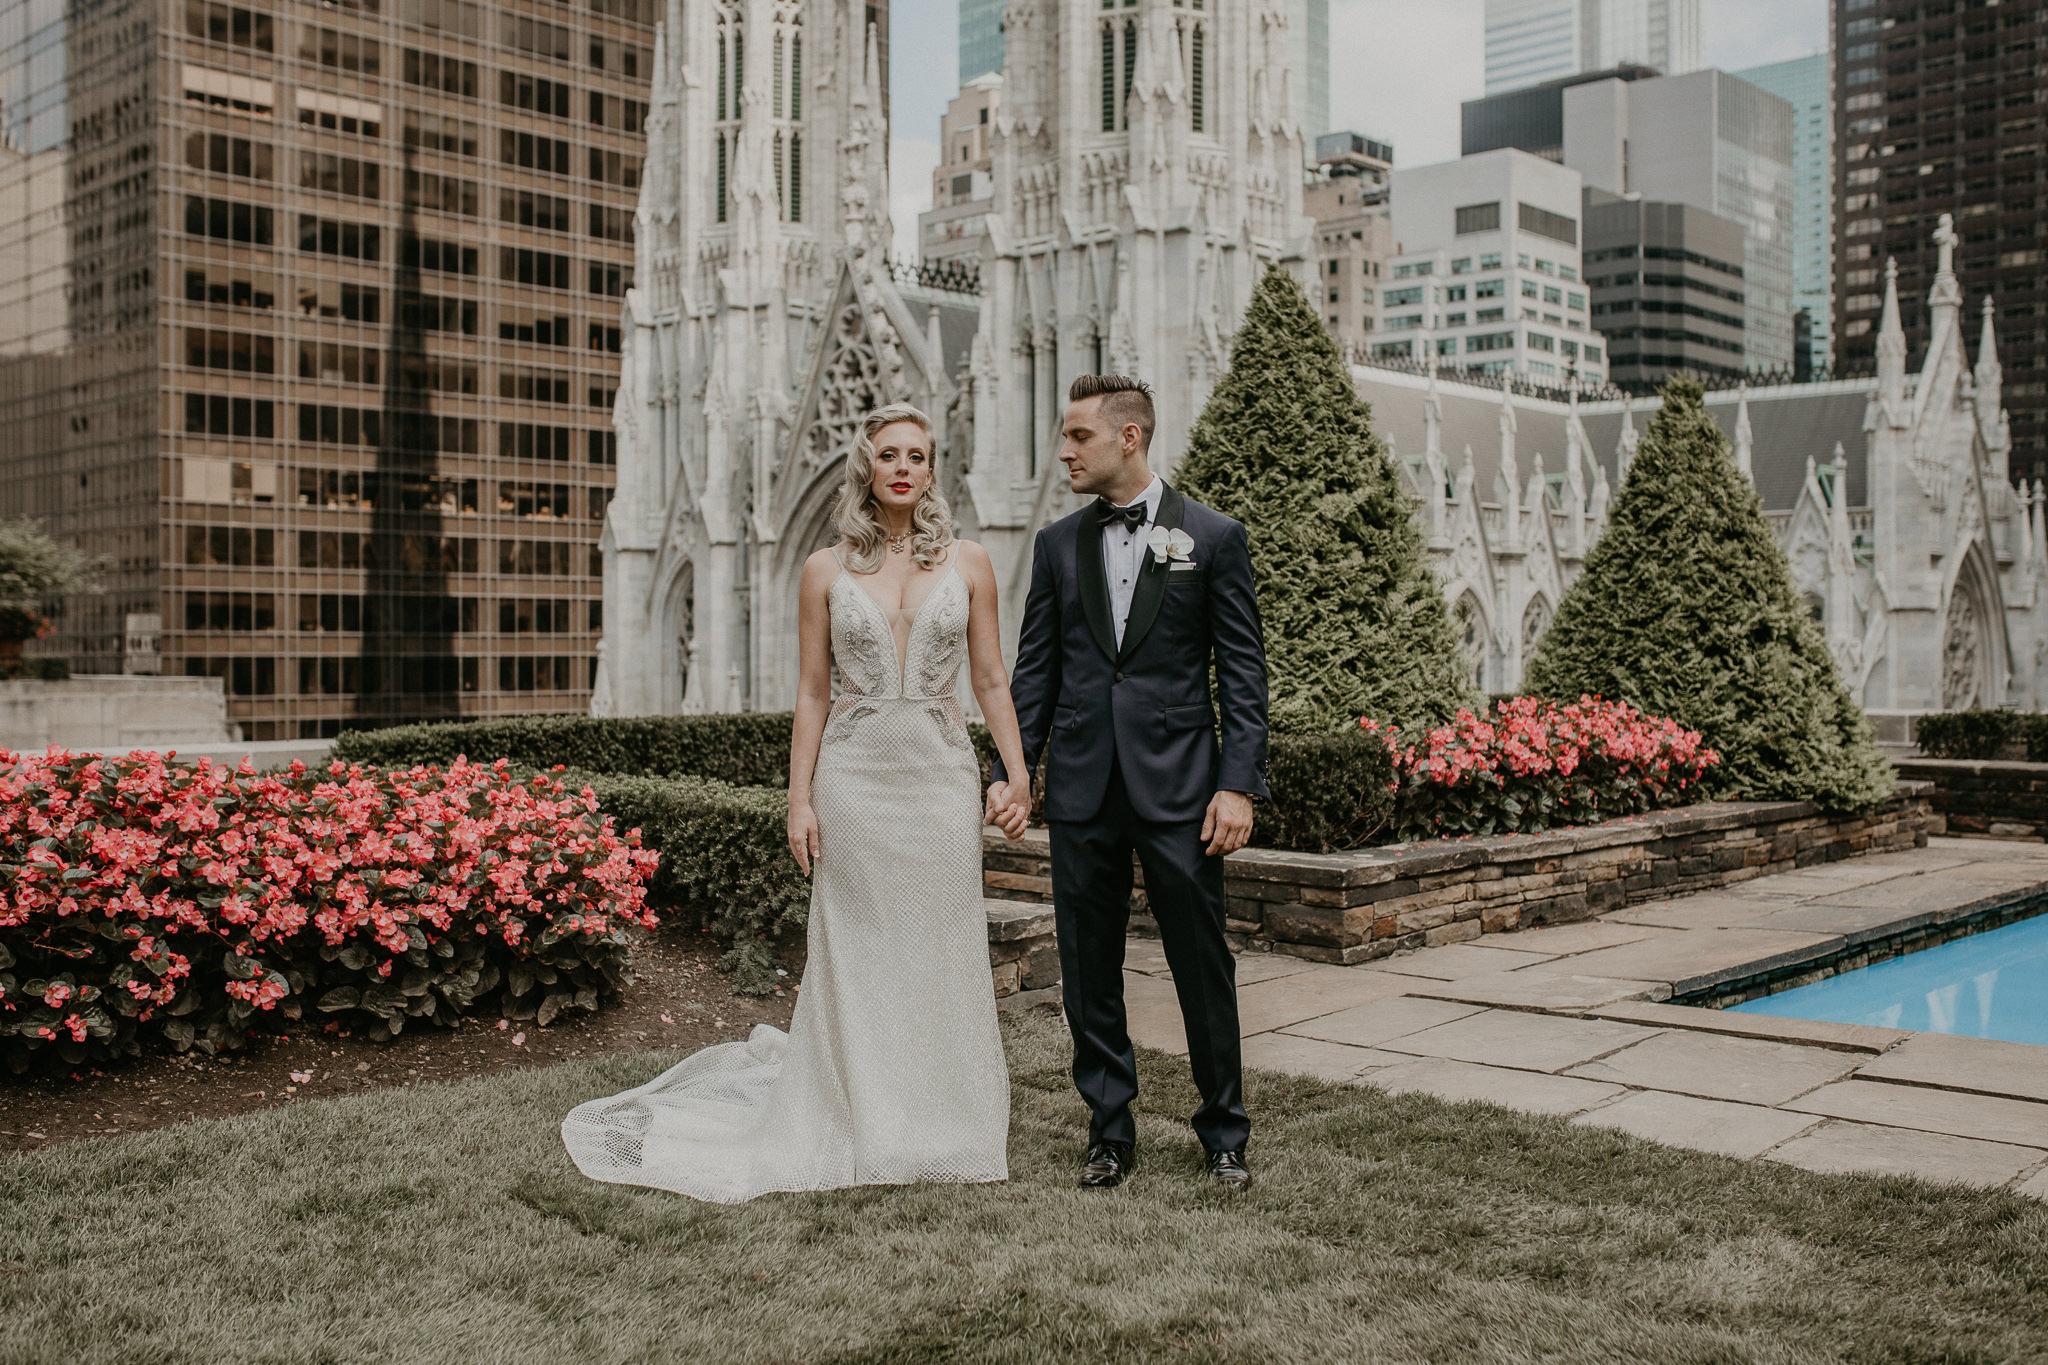 M+J_NYC_Wedding_StPatricks_30Rock_RainbowRoom_057.jpg